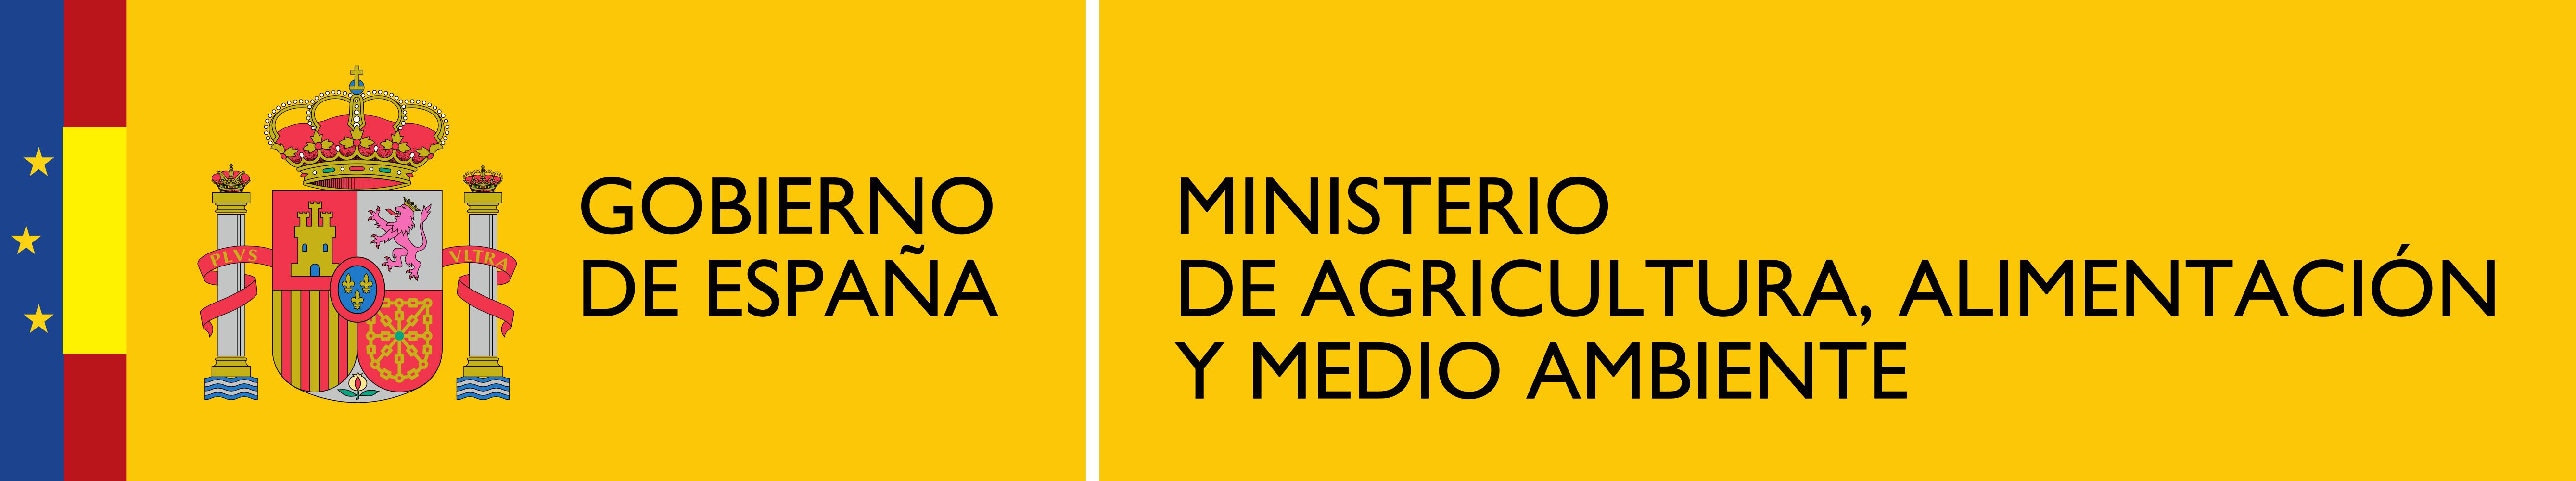 File:Logotipo del Ministerio de Agricultura, Alimentación